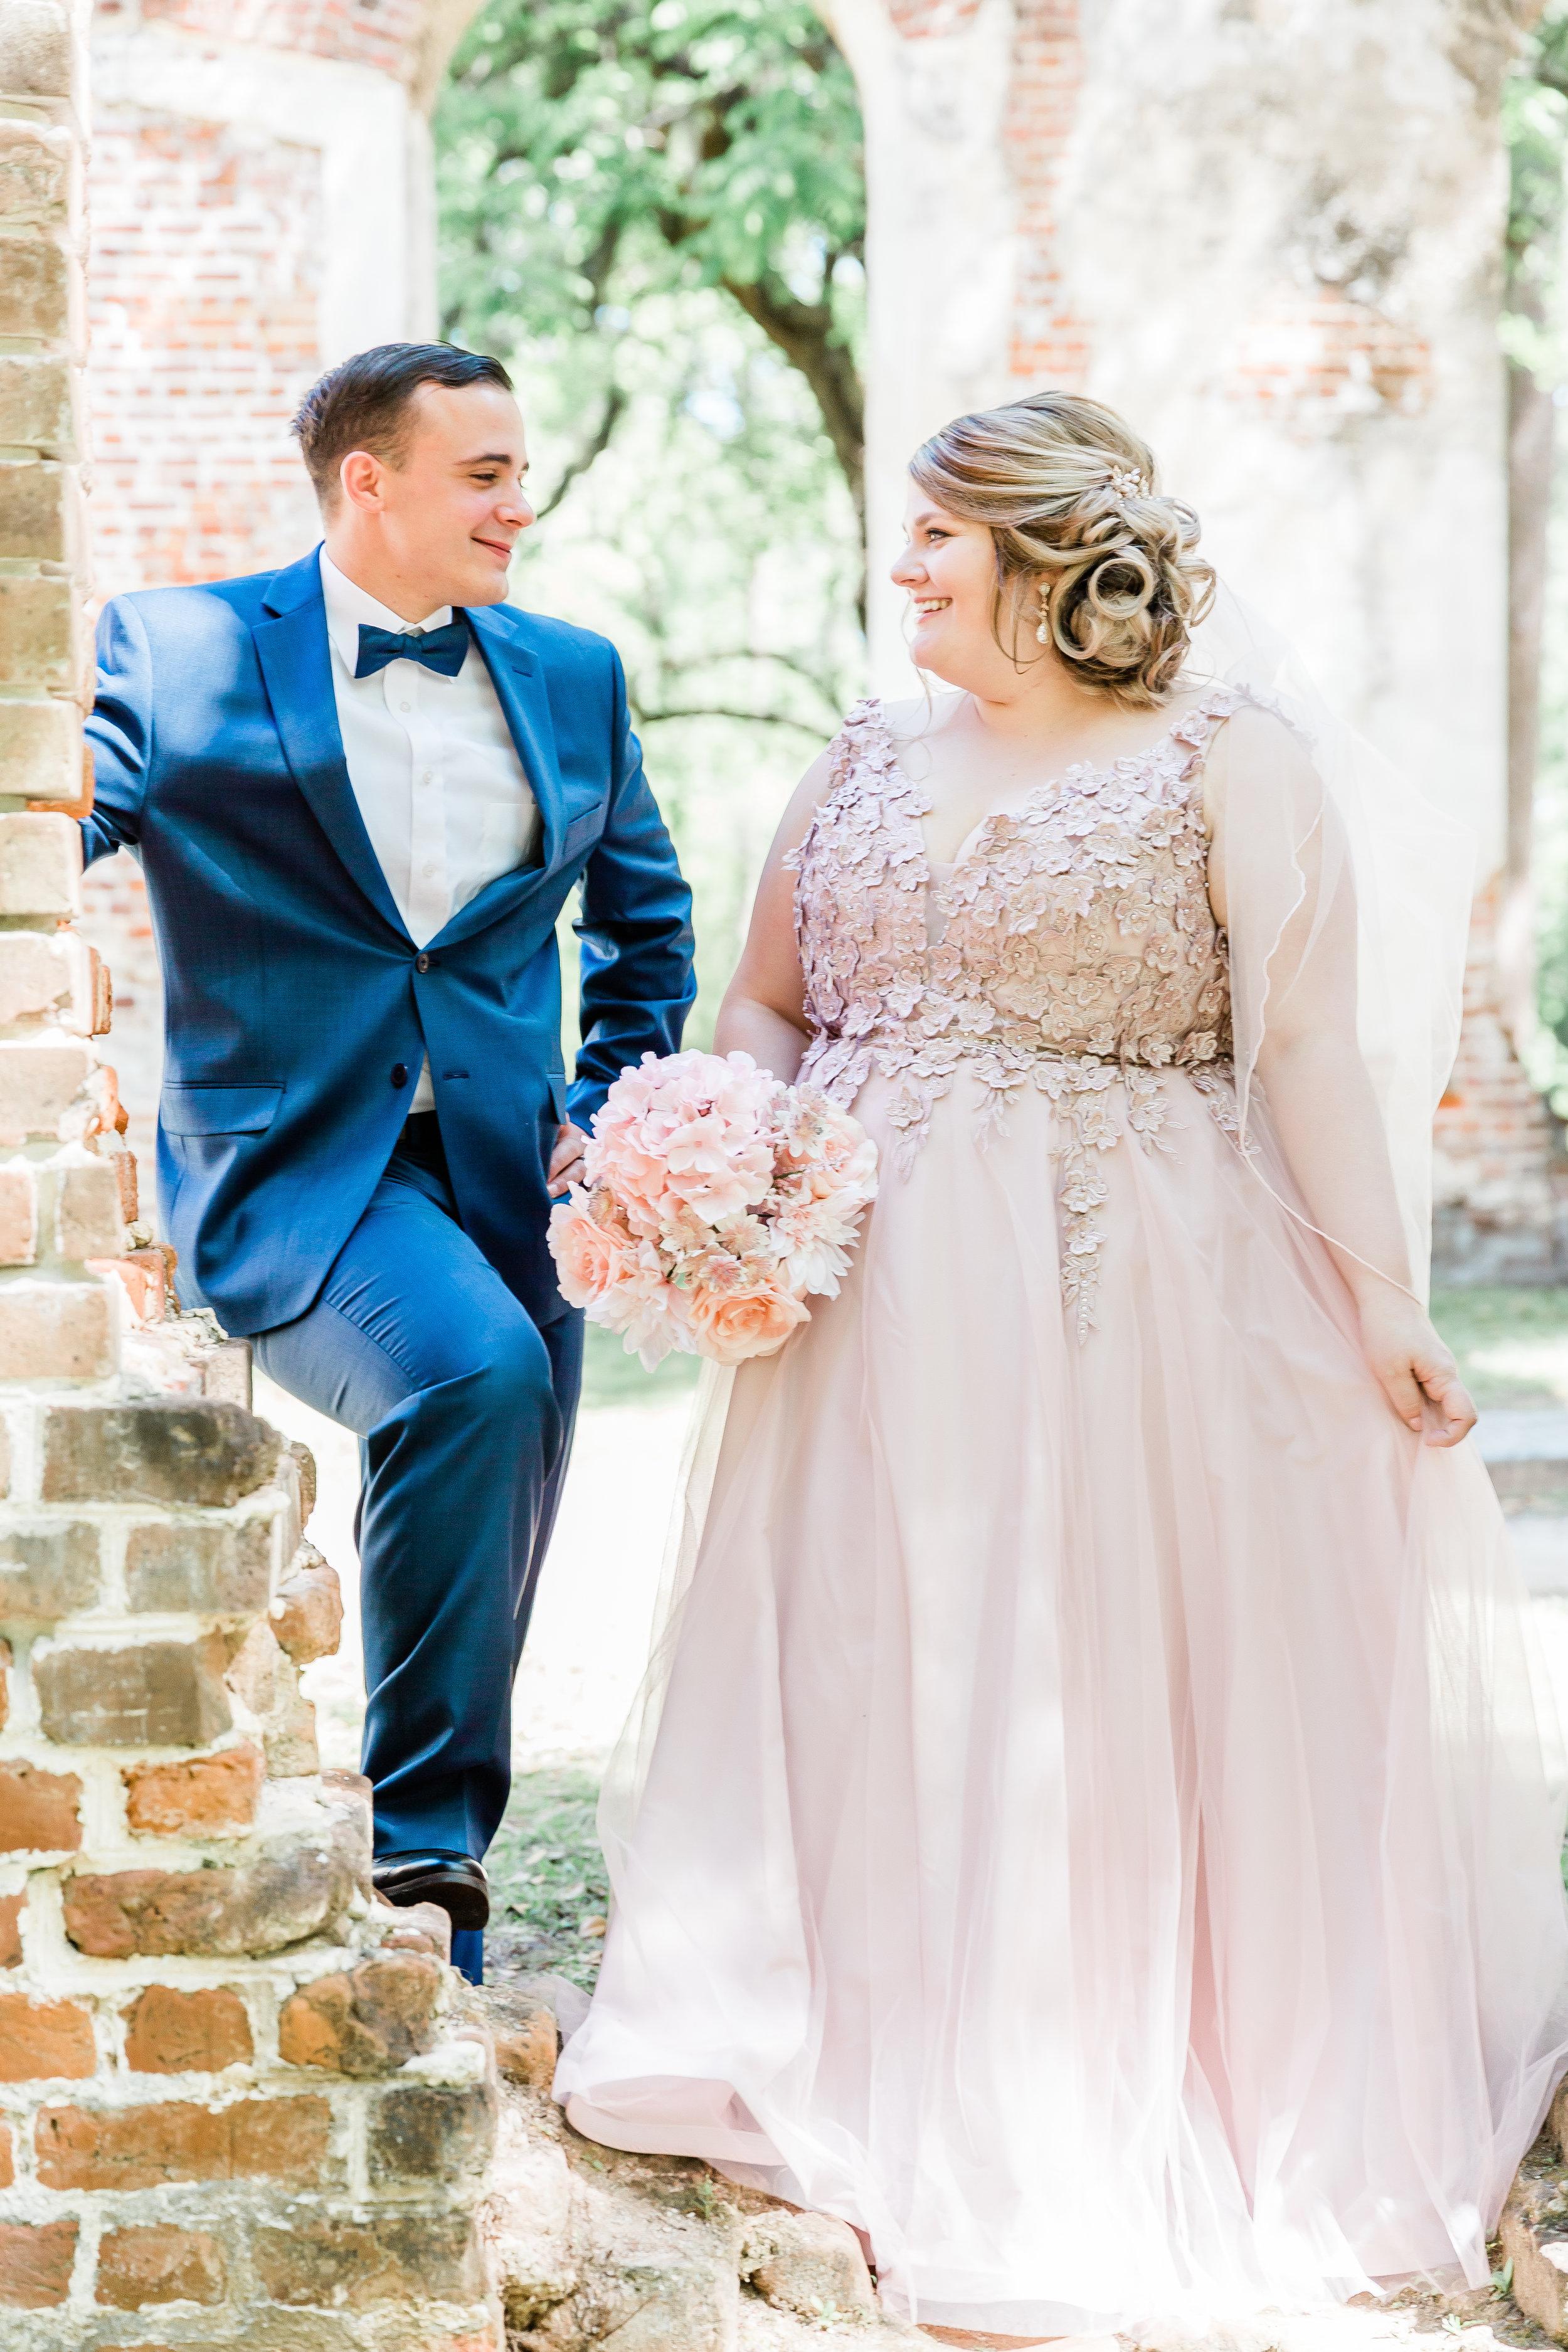 20190417-Southern Lens Photography-savannah family photographer- Ashley and Zack-old sheldon church ruins-201927.jpg